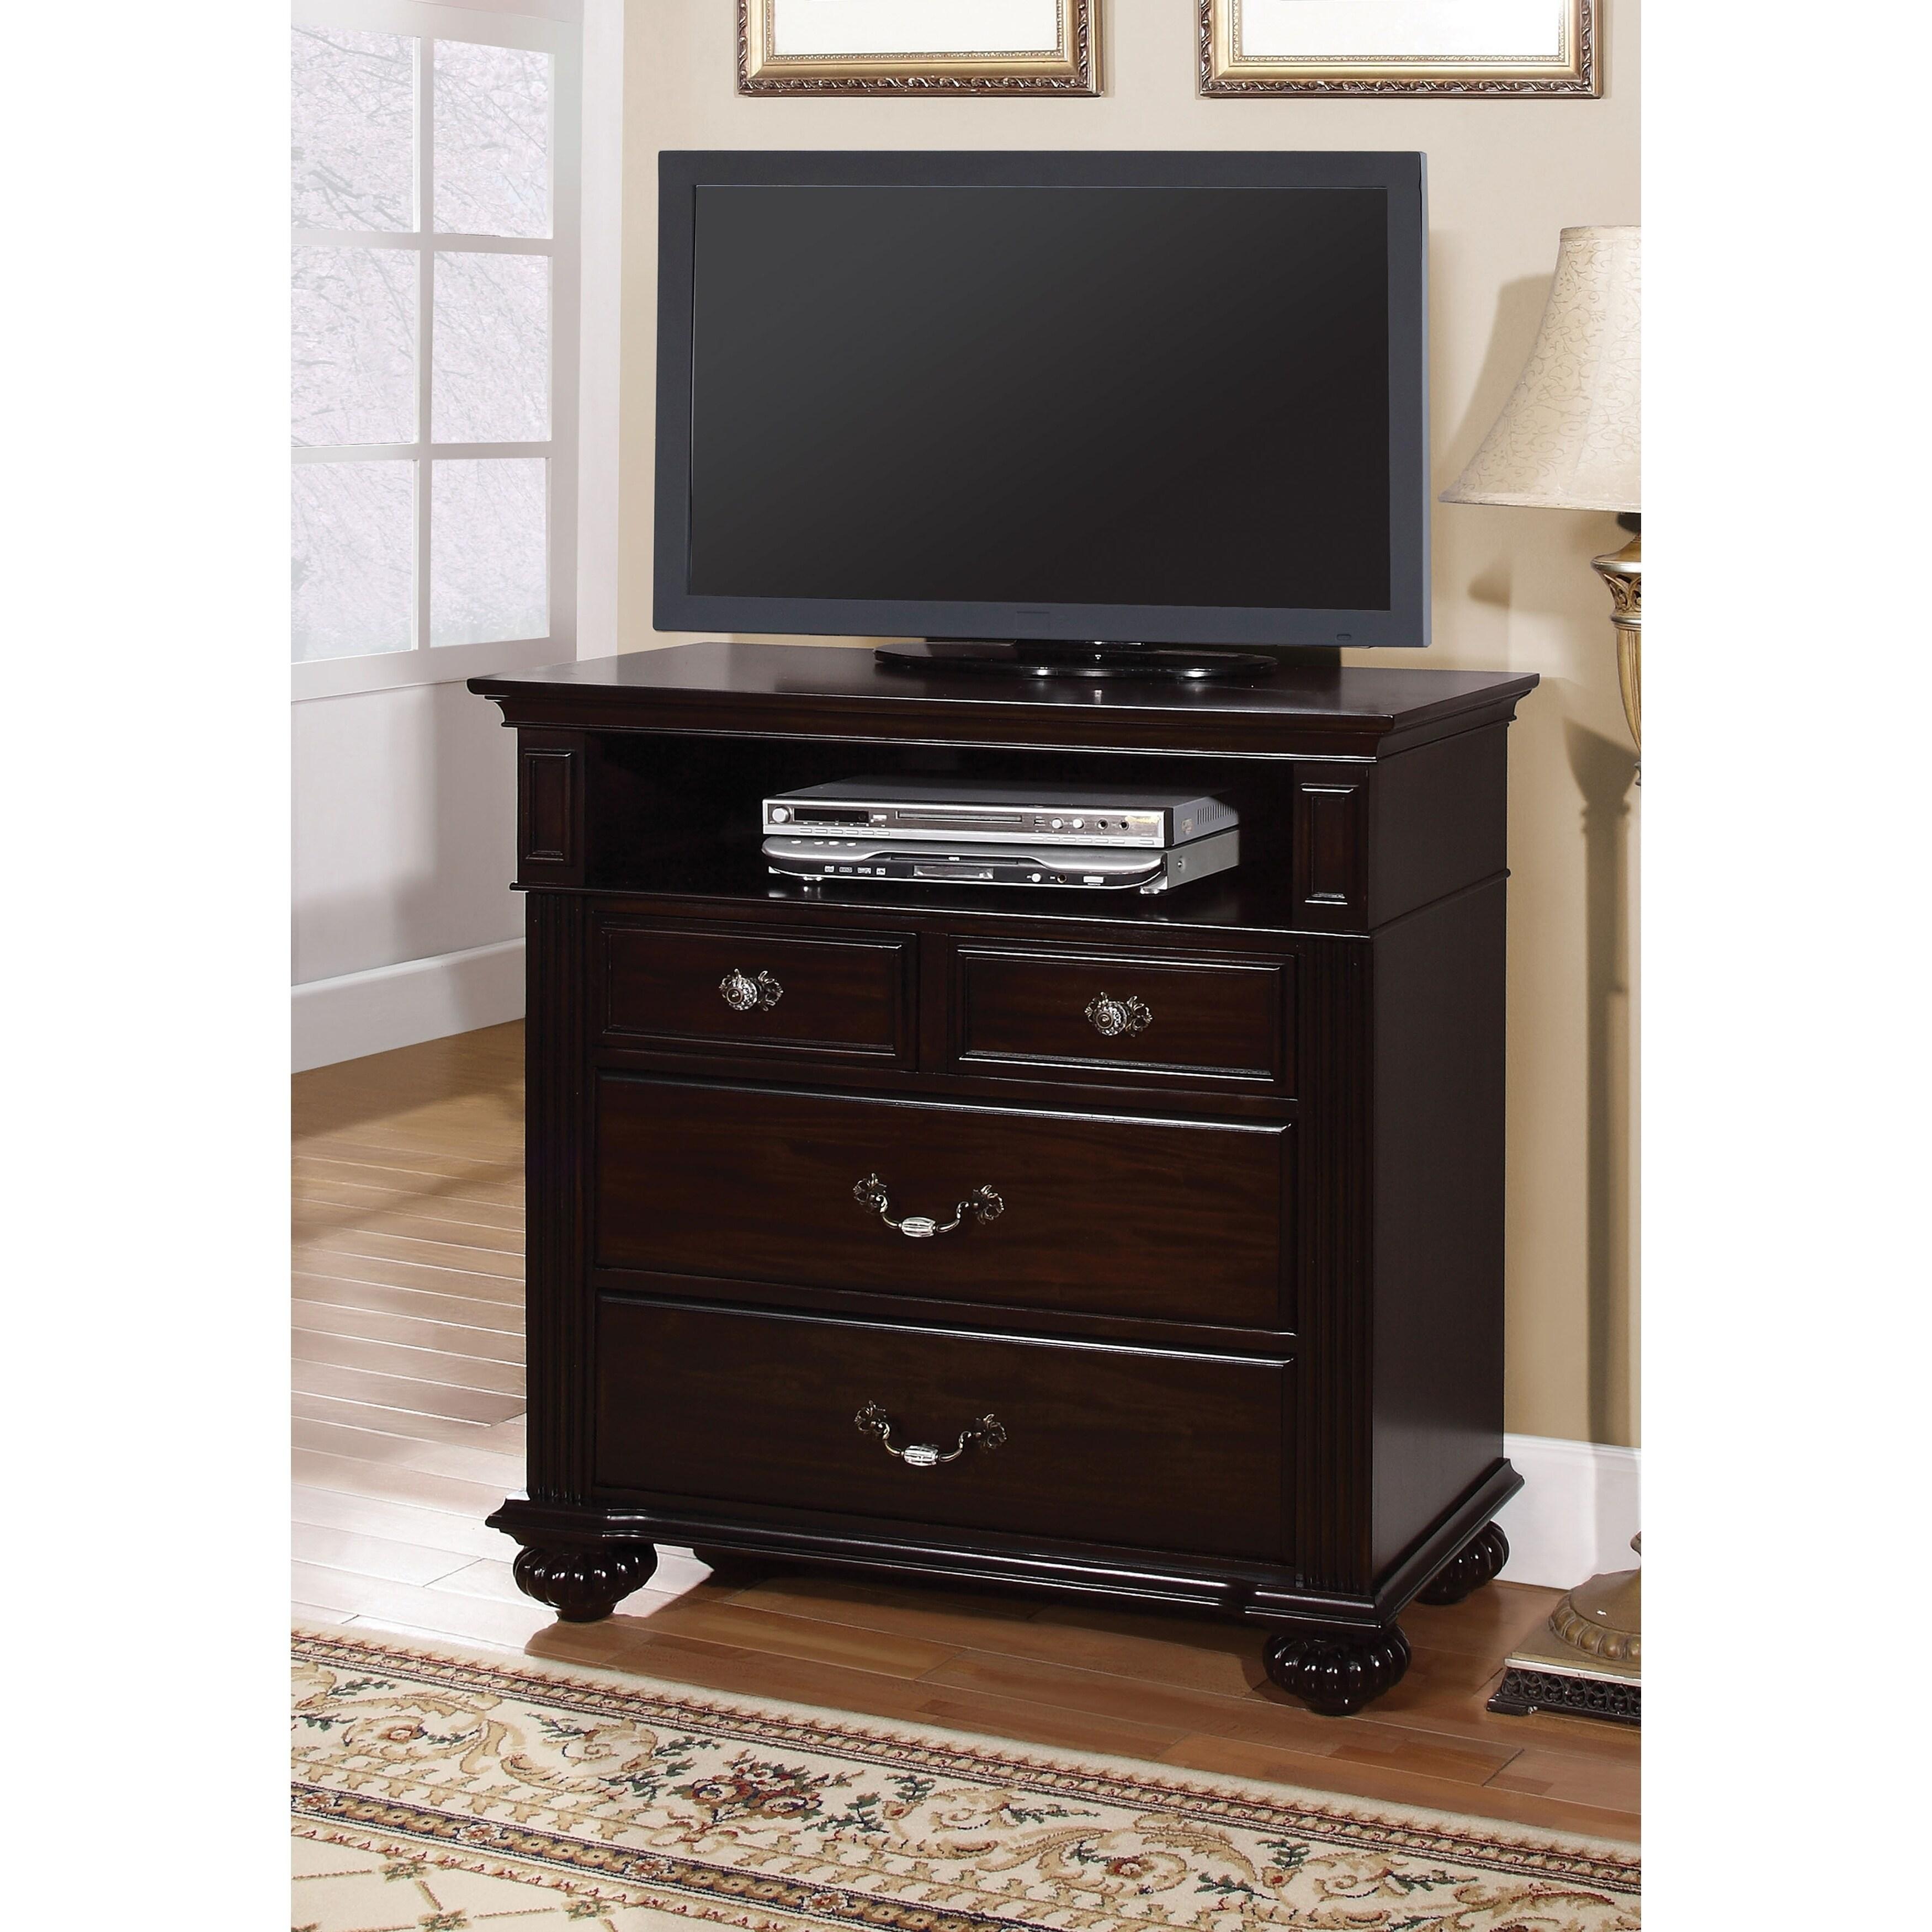 Furniture of America Grande Dark Walnut Media Chest (Dark...